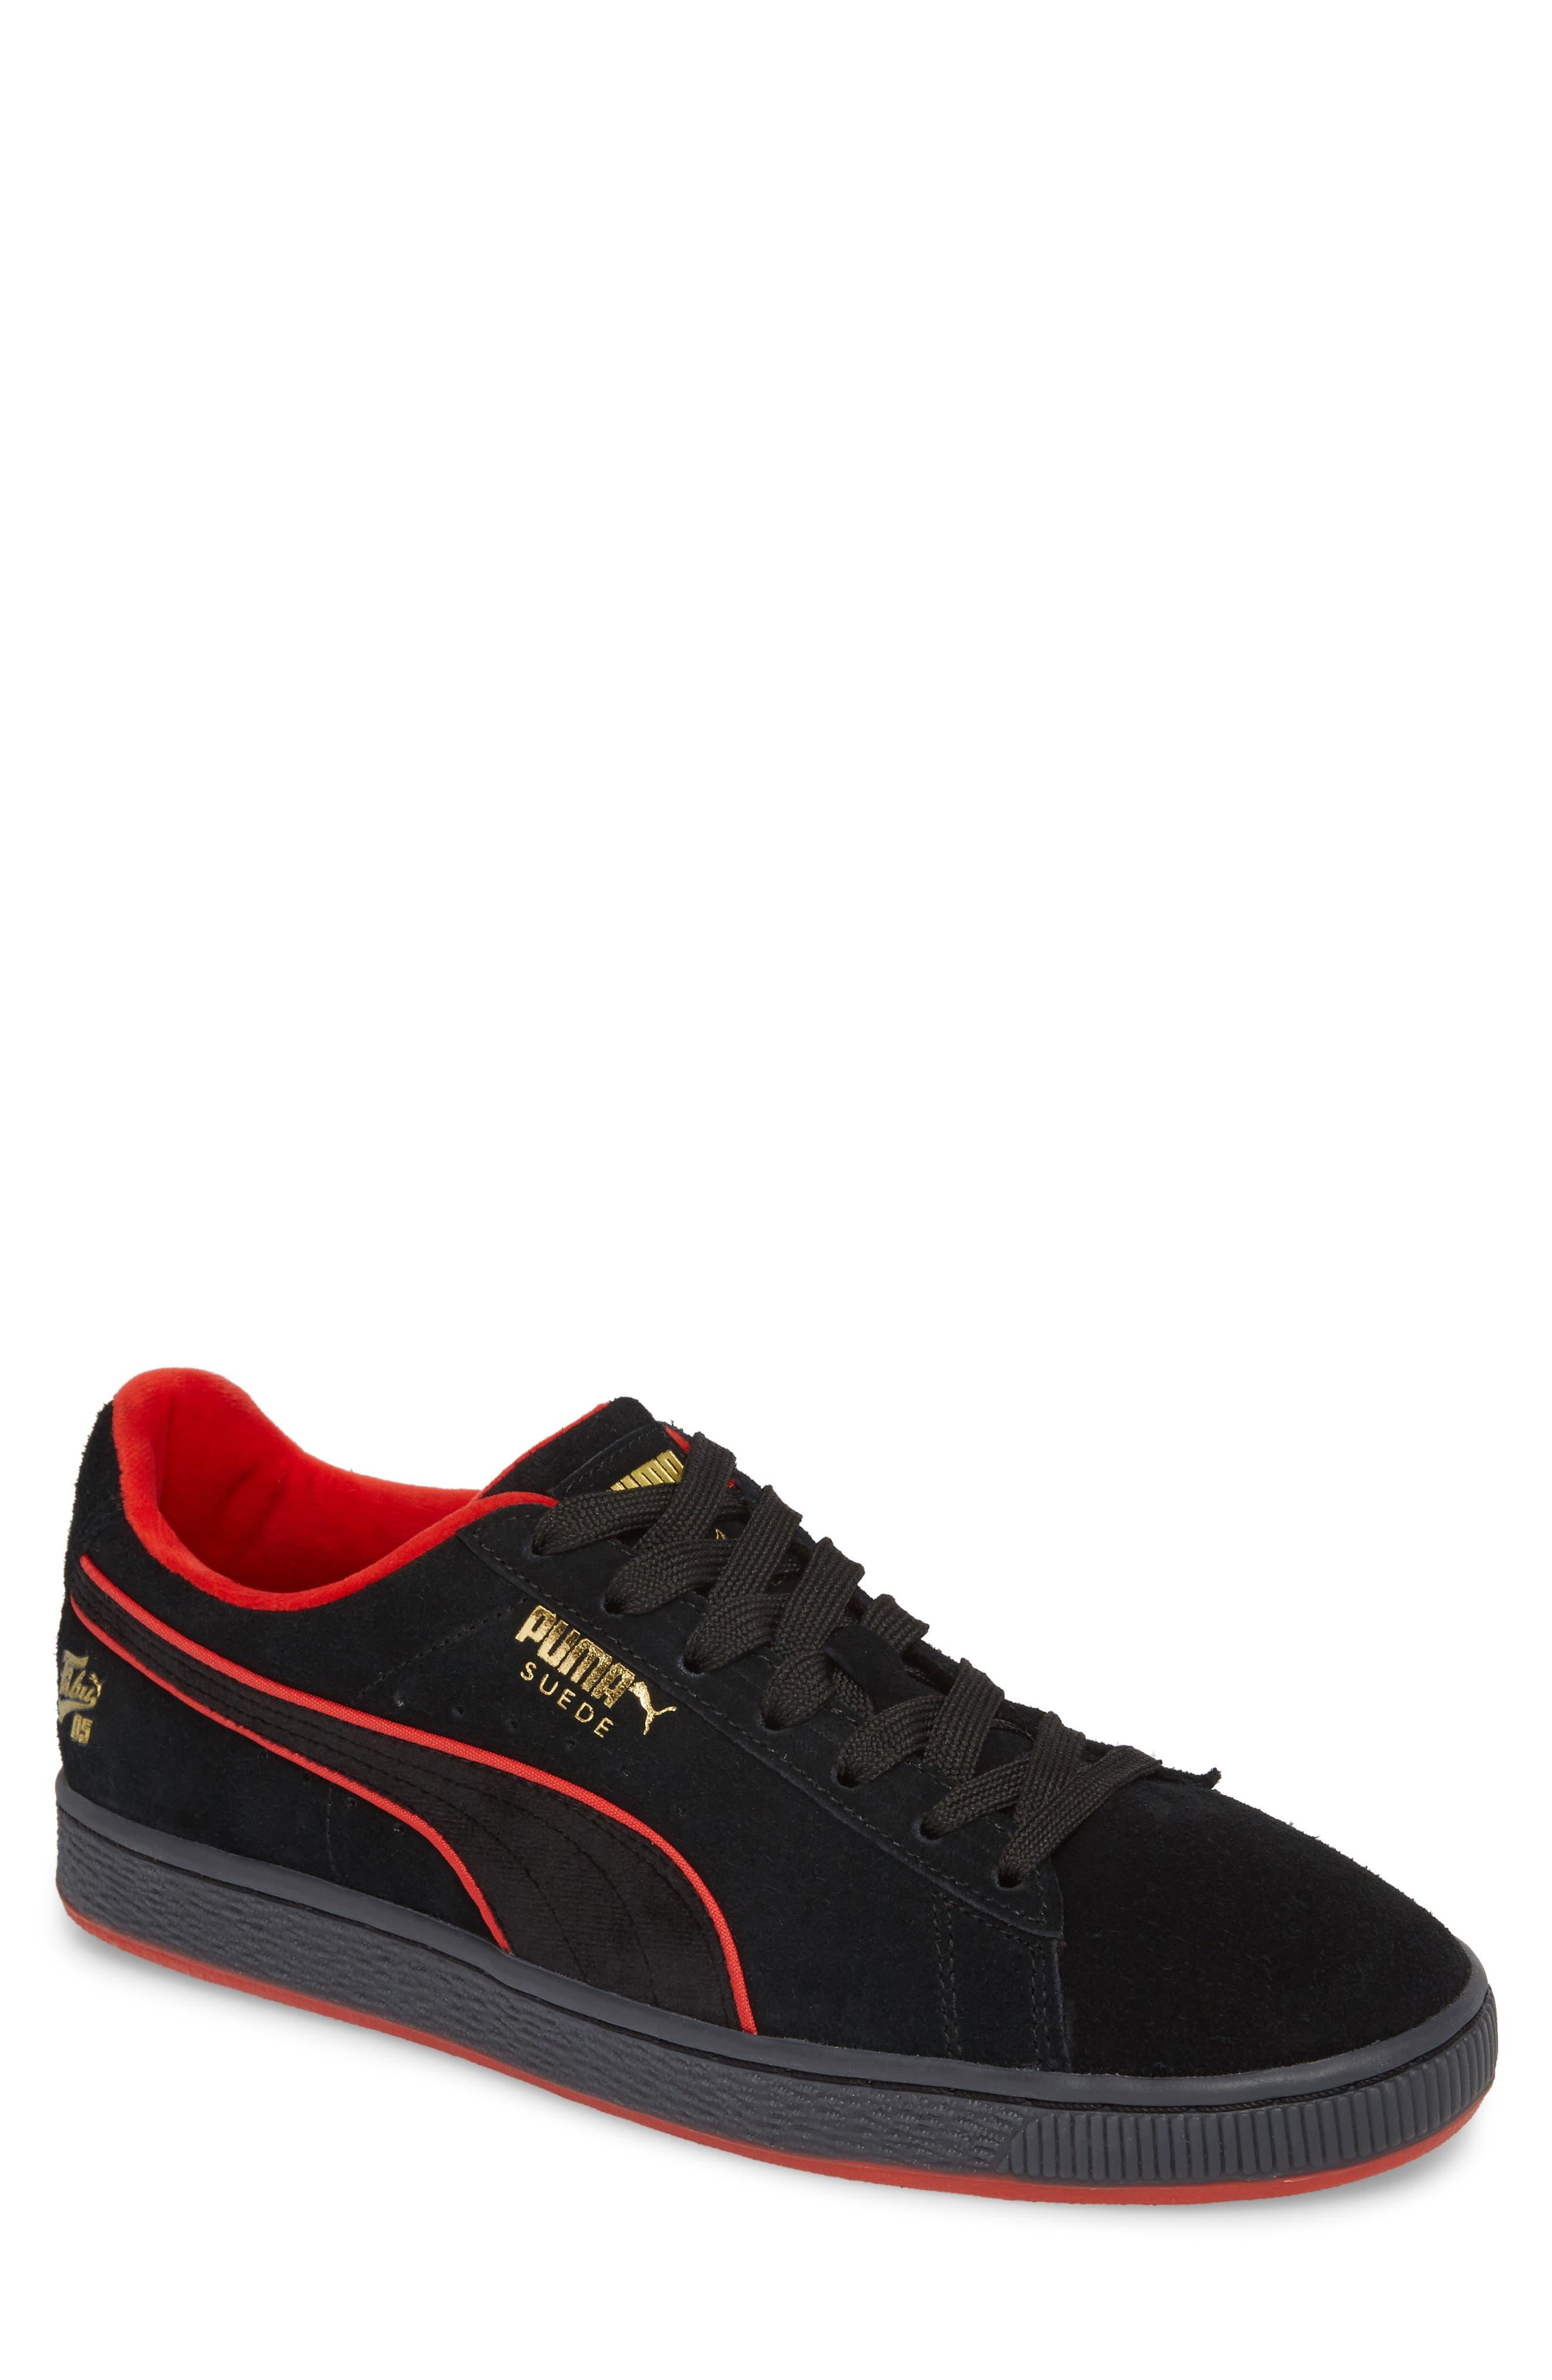 x FUBU Suede Classic Sneaker,                             Main thumbnail 1, color,                             001